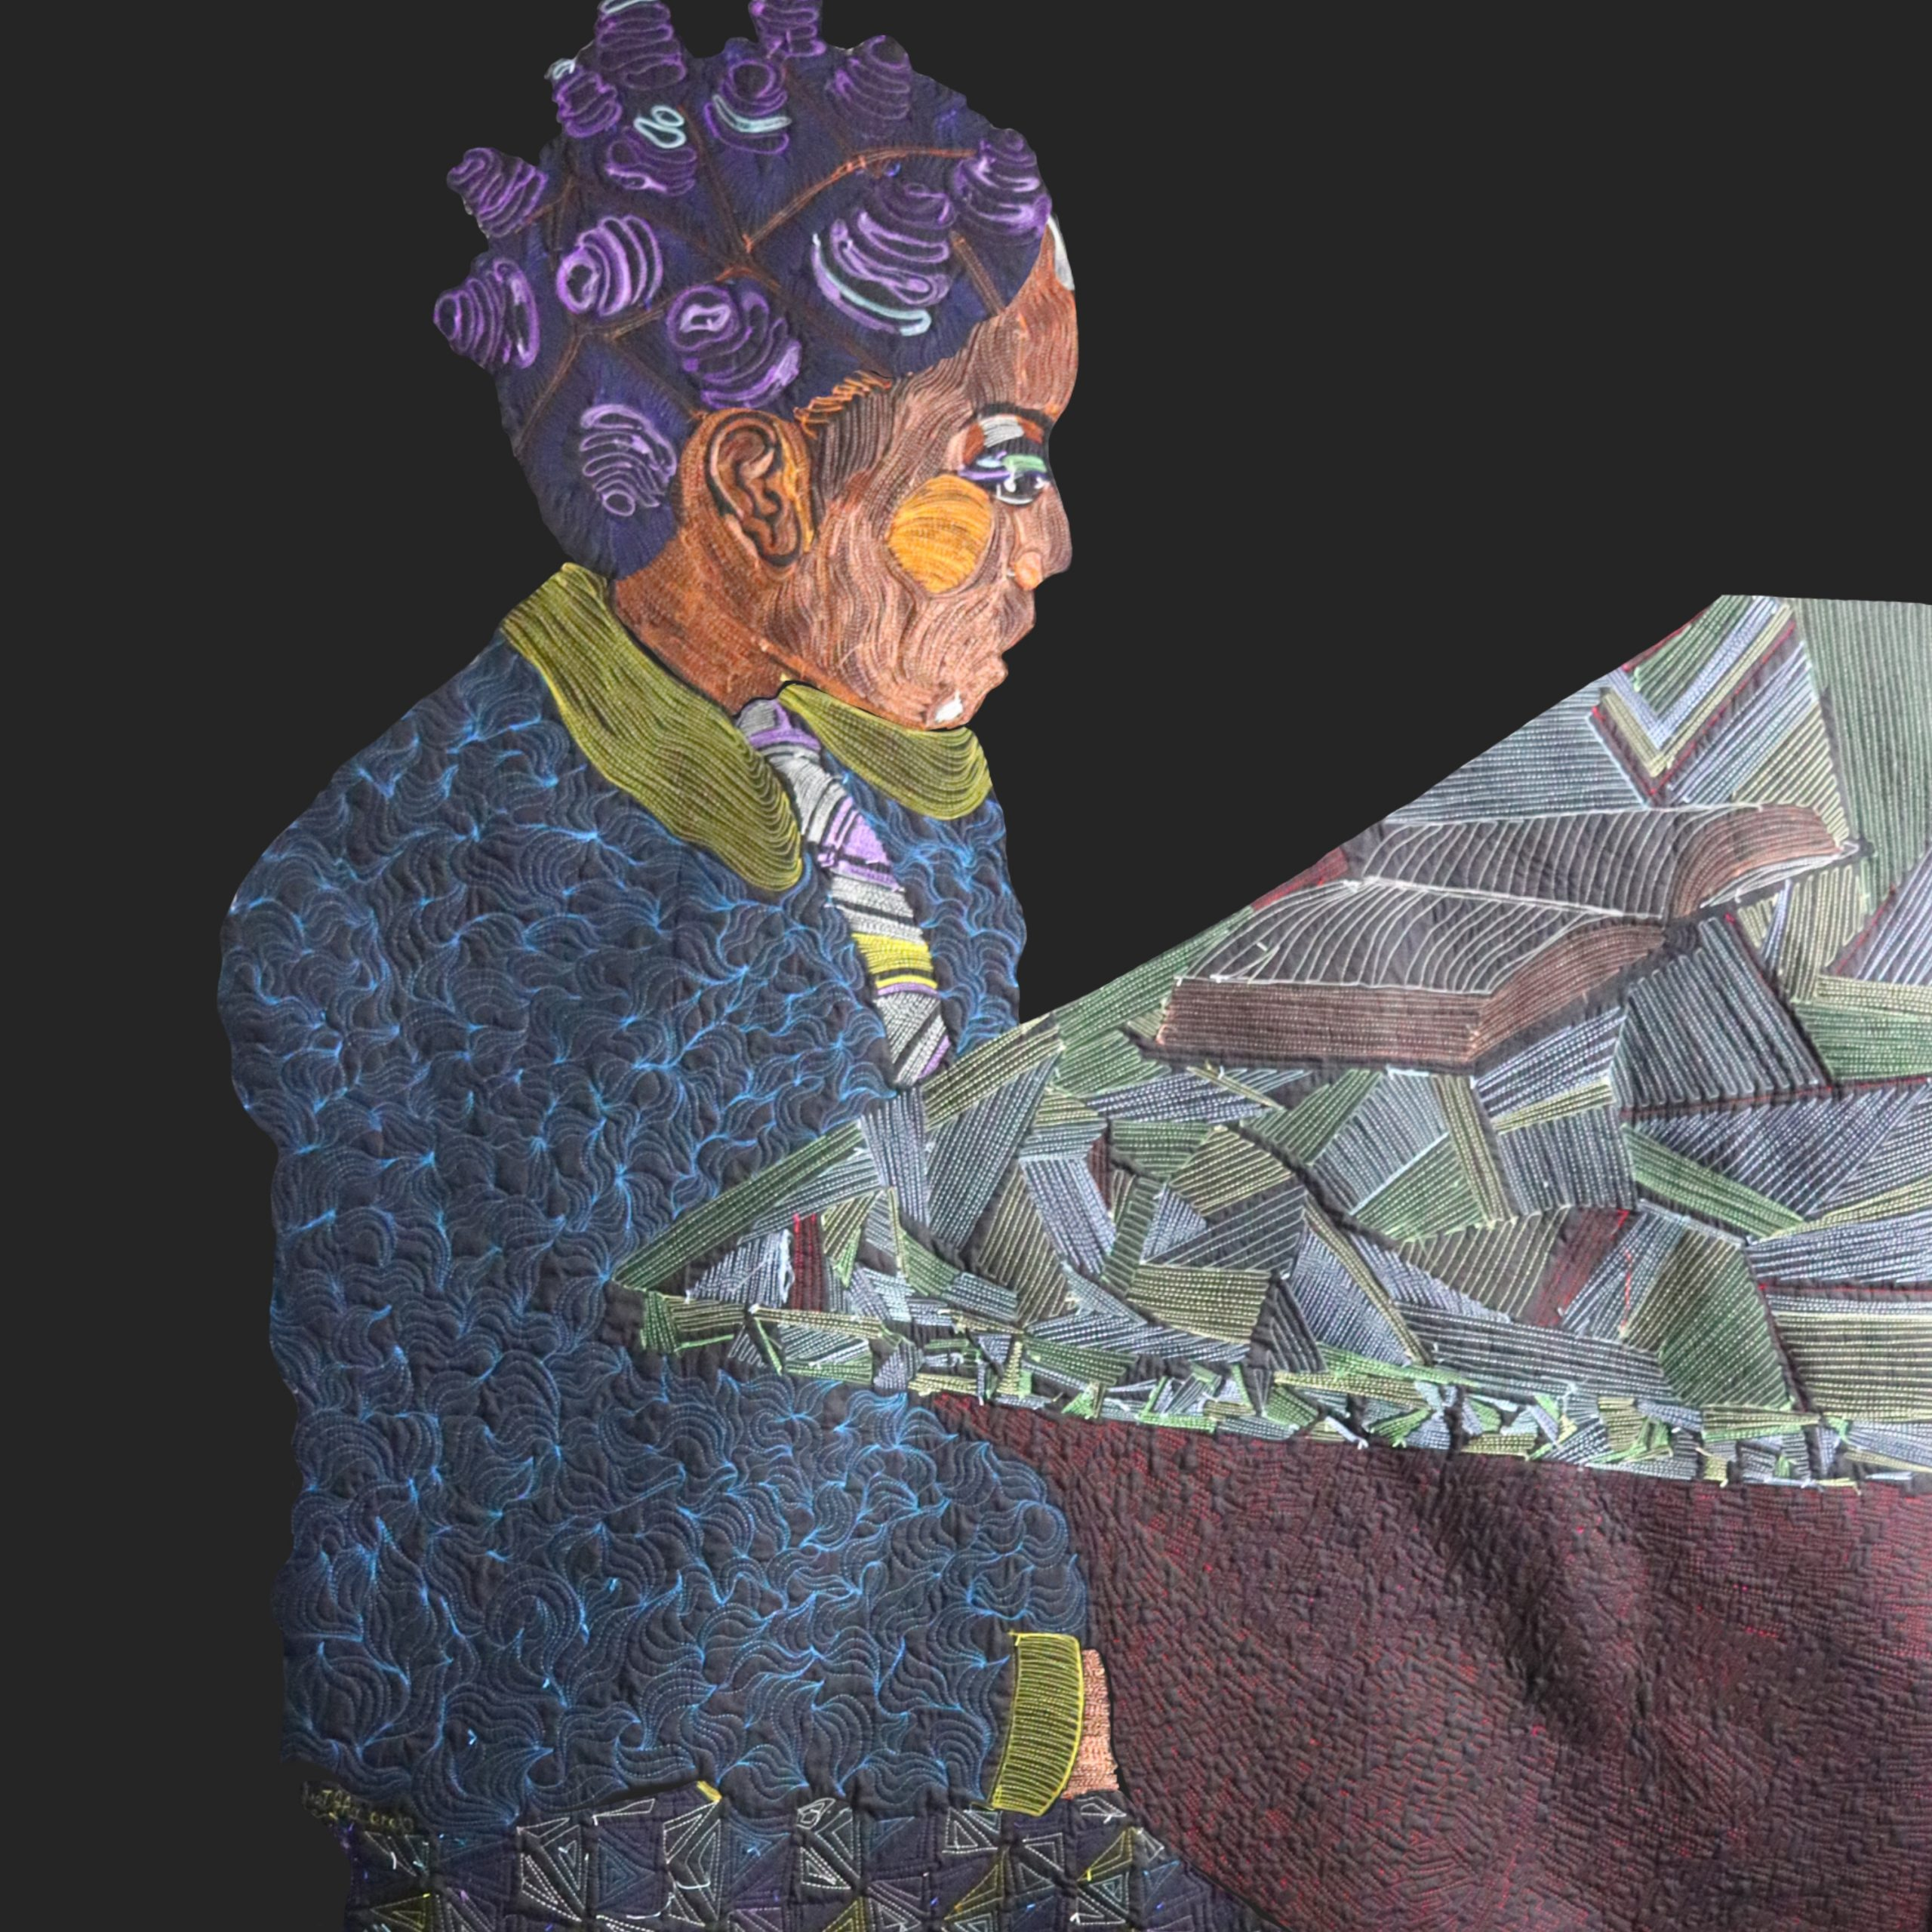 Bantu Knots | Thread Sketching | Textile Art